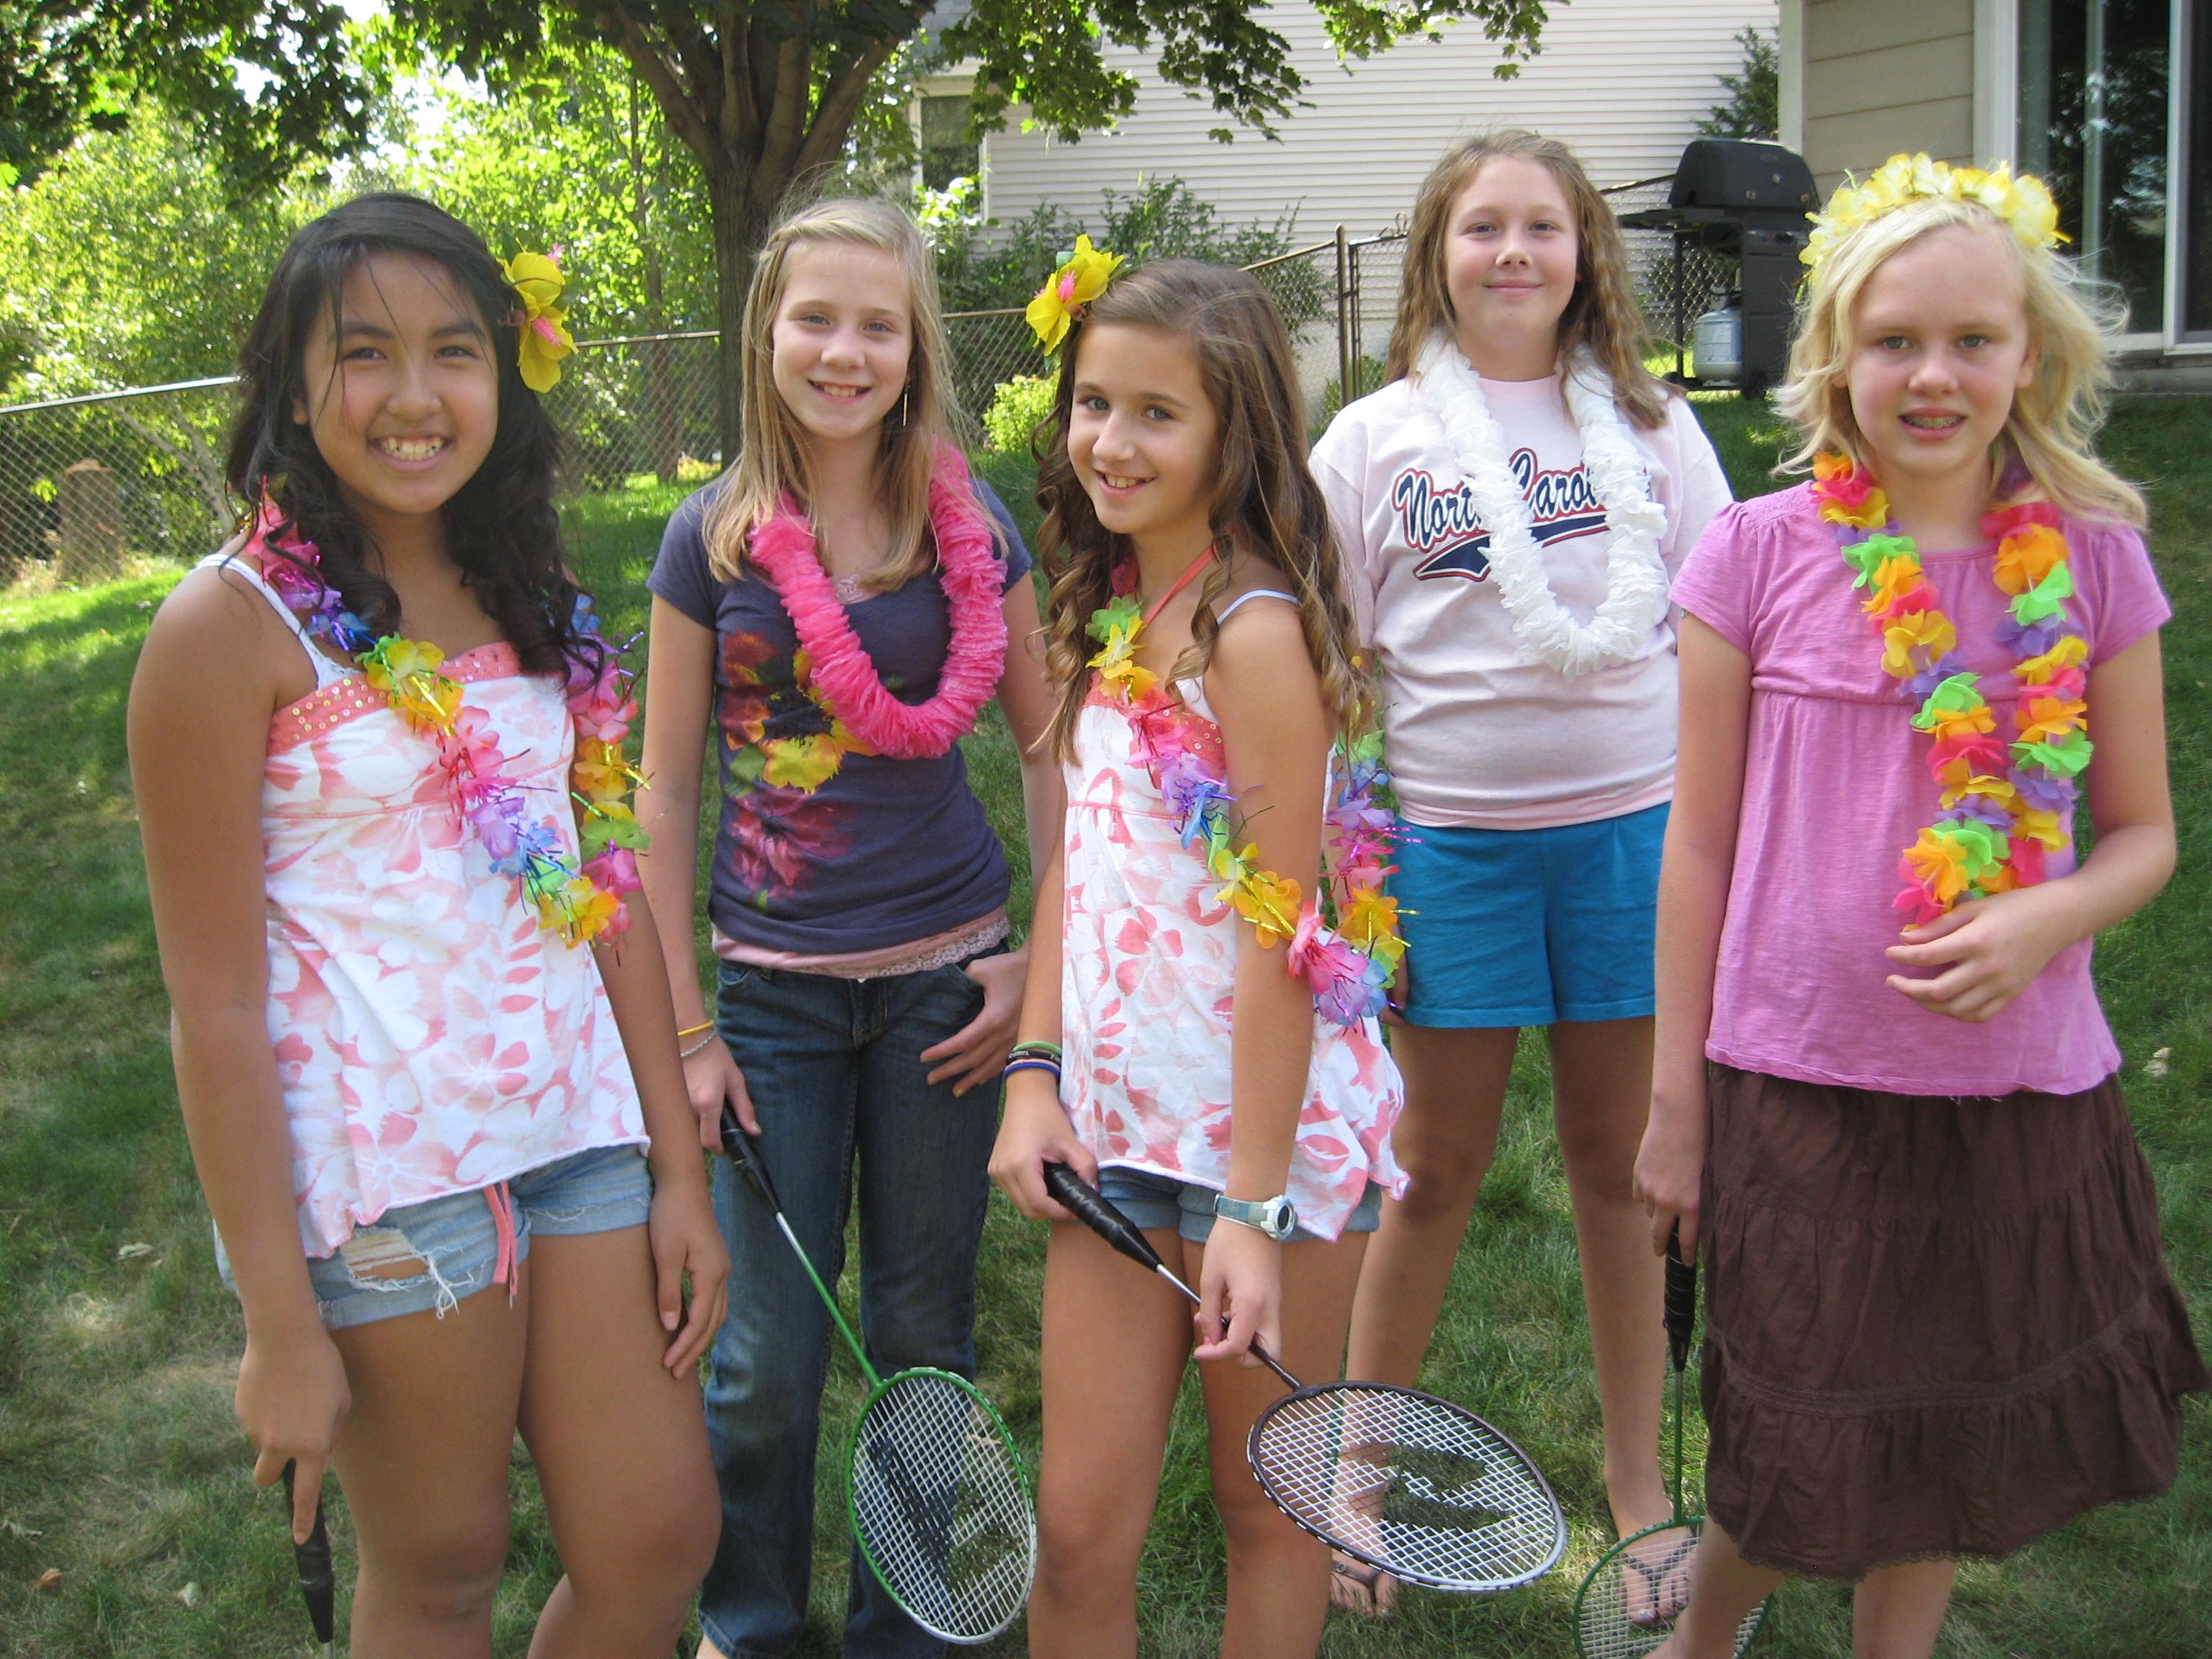 6th Graders In Bikinis